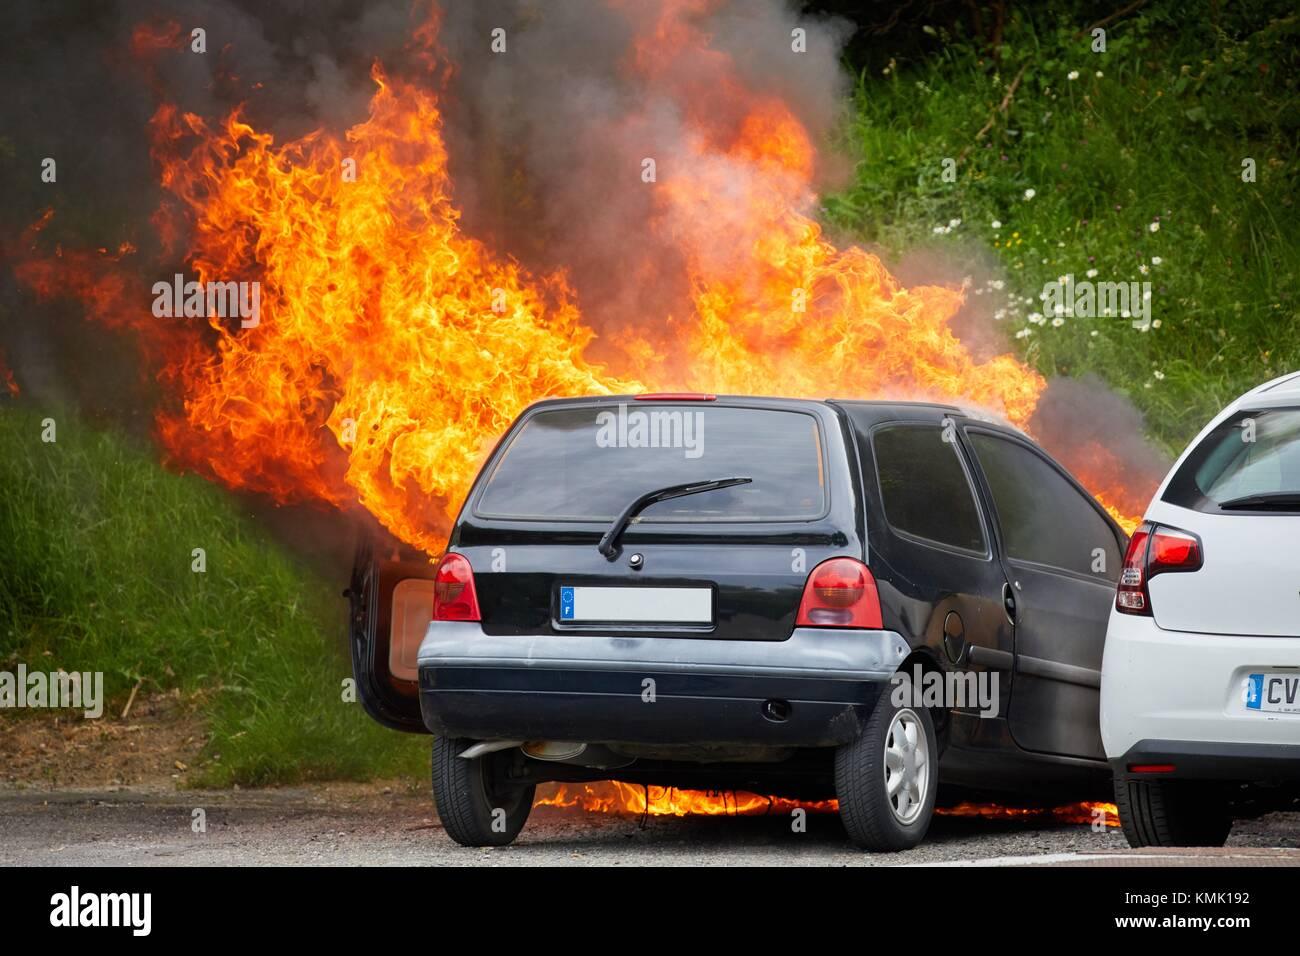 Burning car - Stock Image